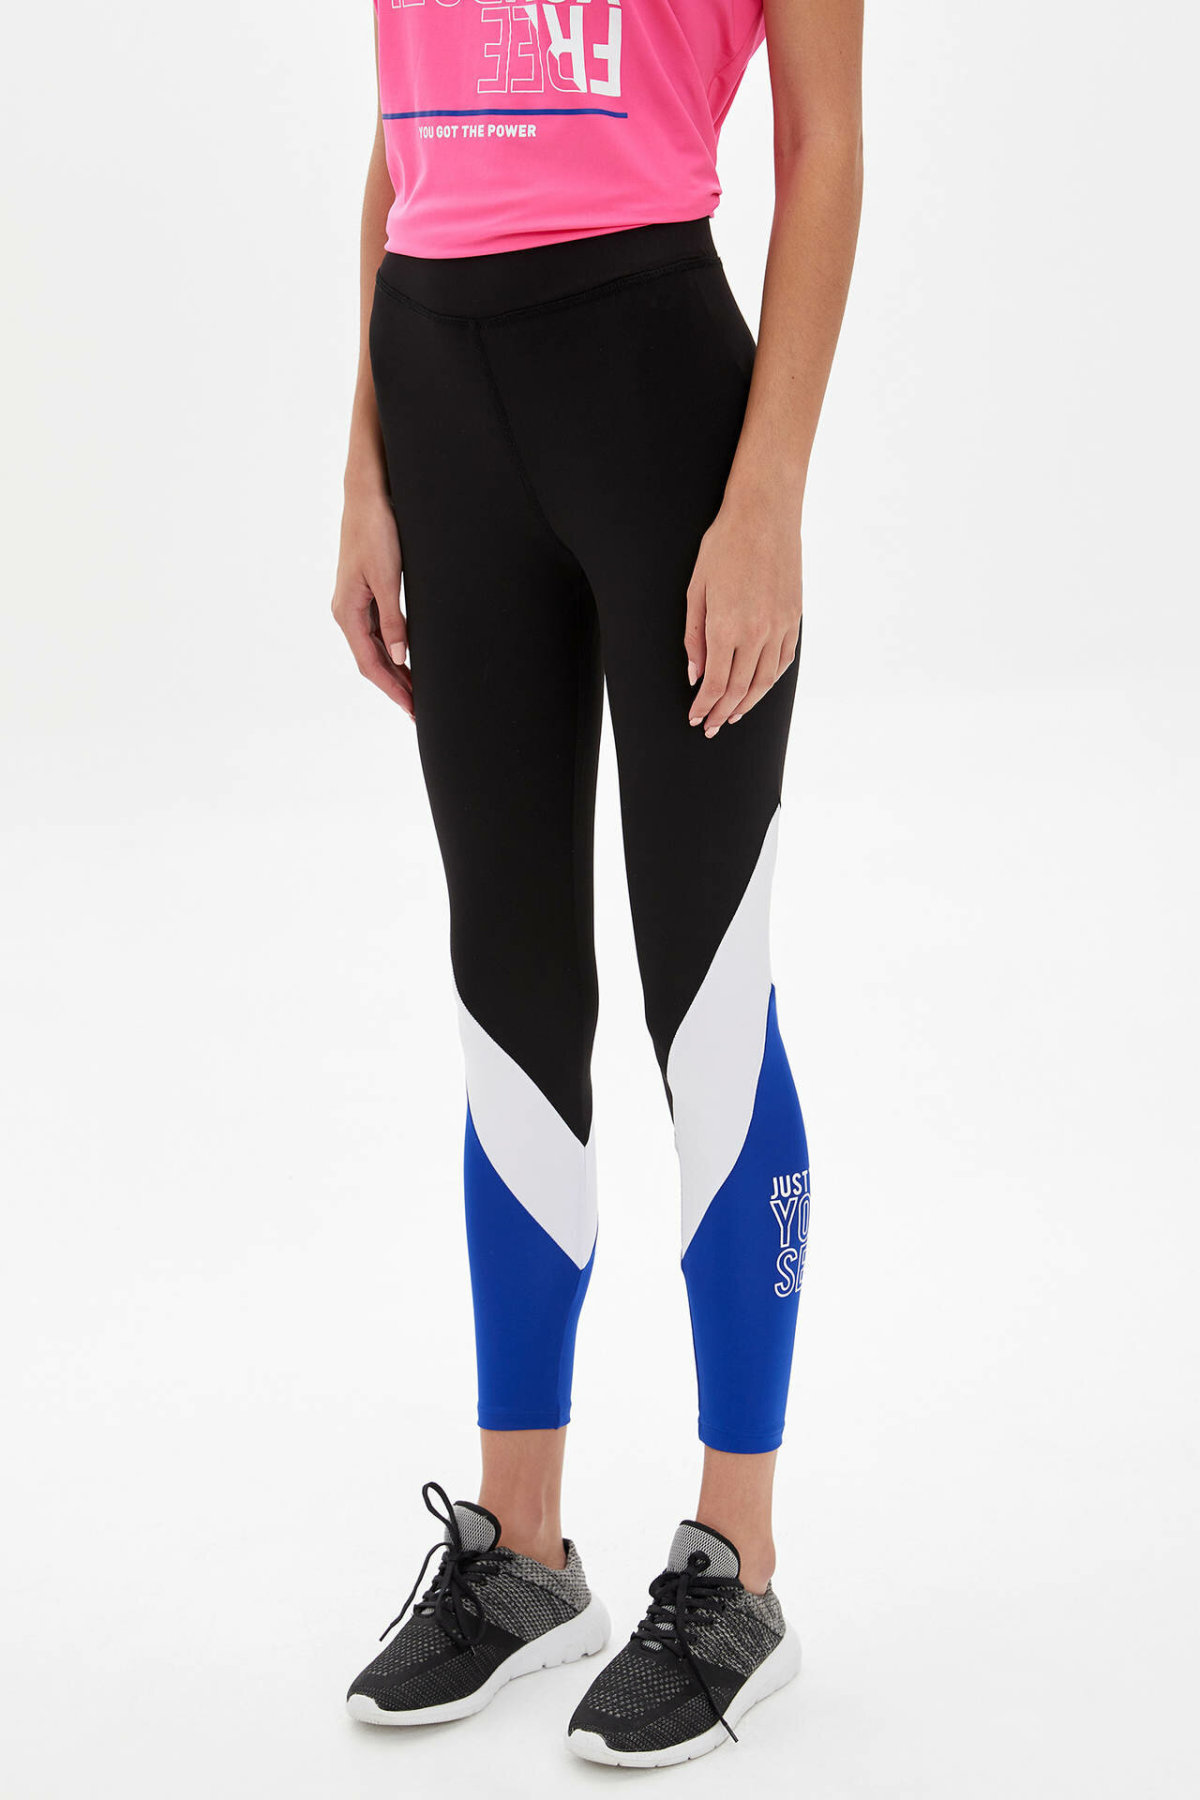 DeFacto Women Fashion High Waist Casual Women's Skinny Trousers Ladies Striped Sport Leggings Sweatpants - M0671AZ19AU